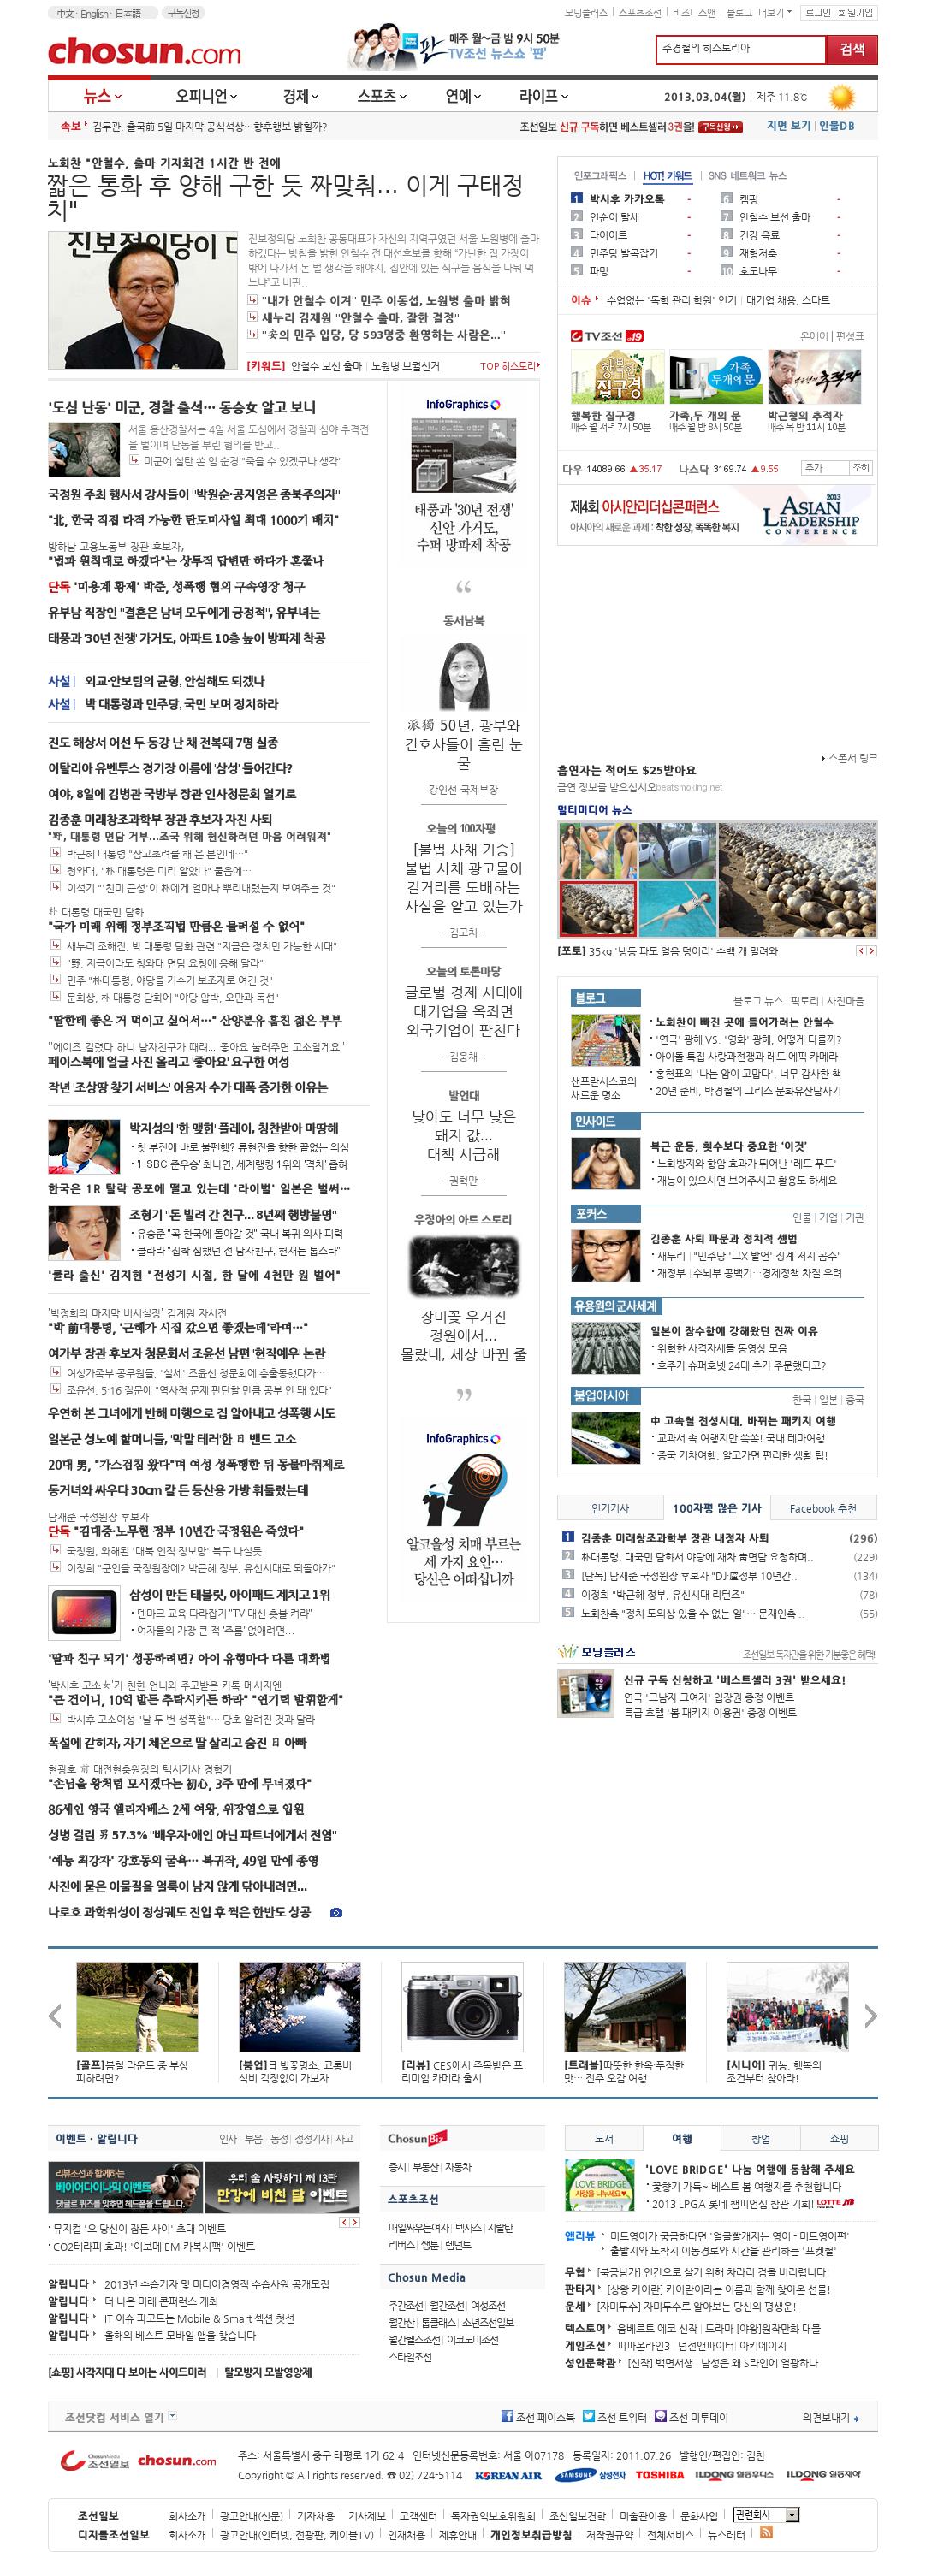 chosun.com at Monday March 4, 2013, 10:02 a.m. UTC